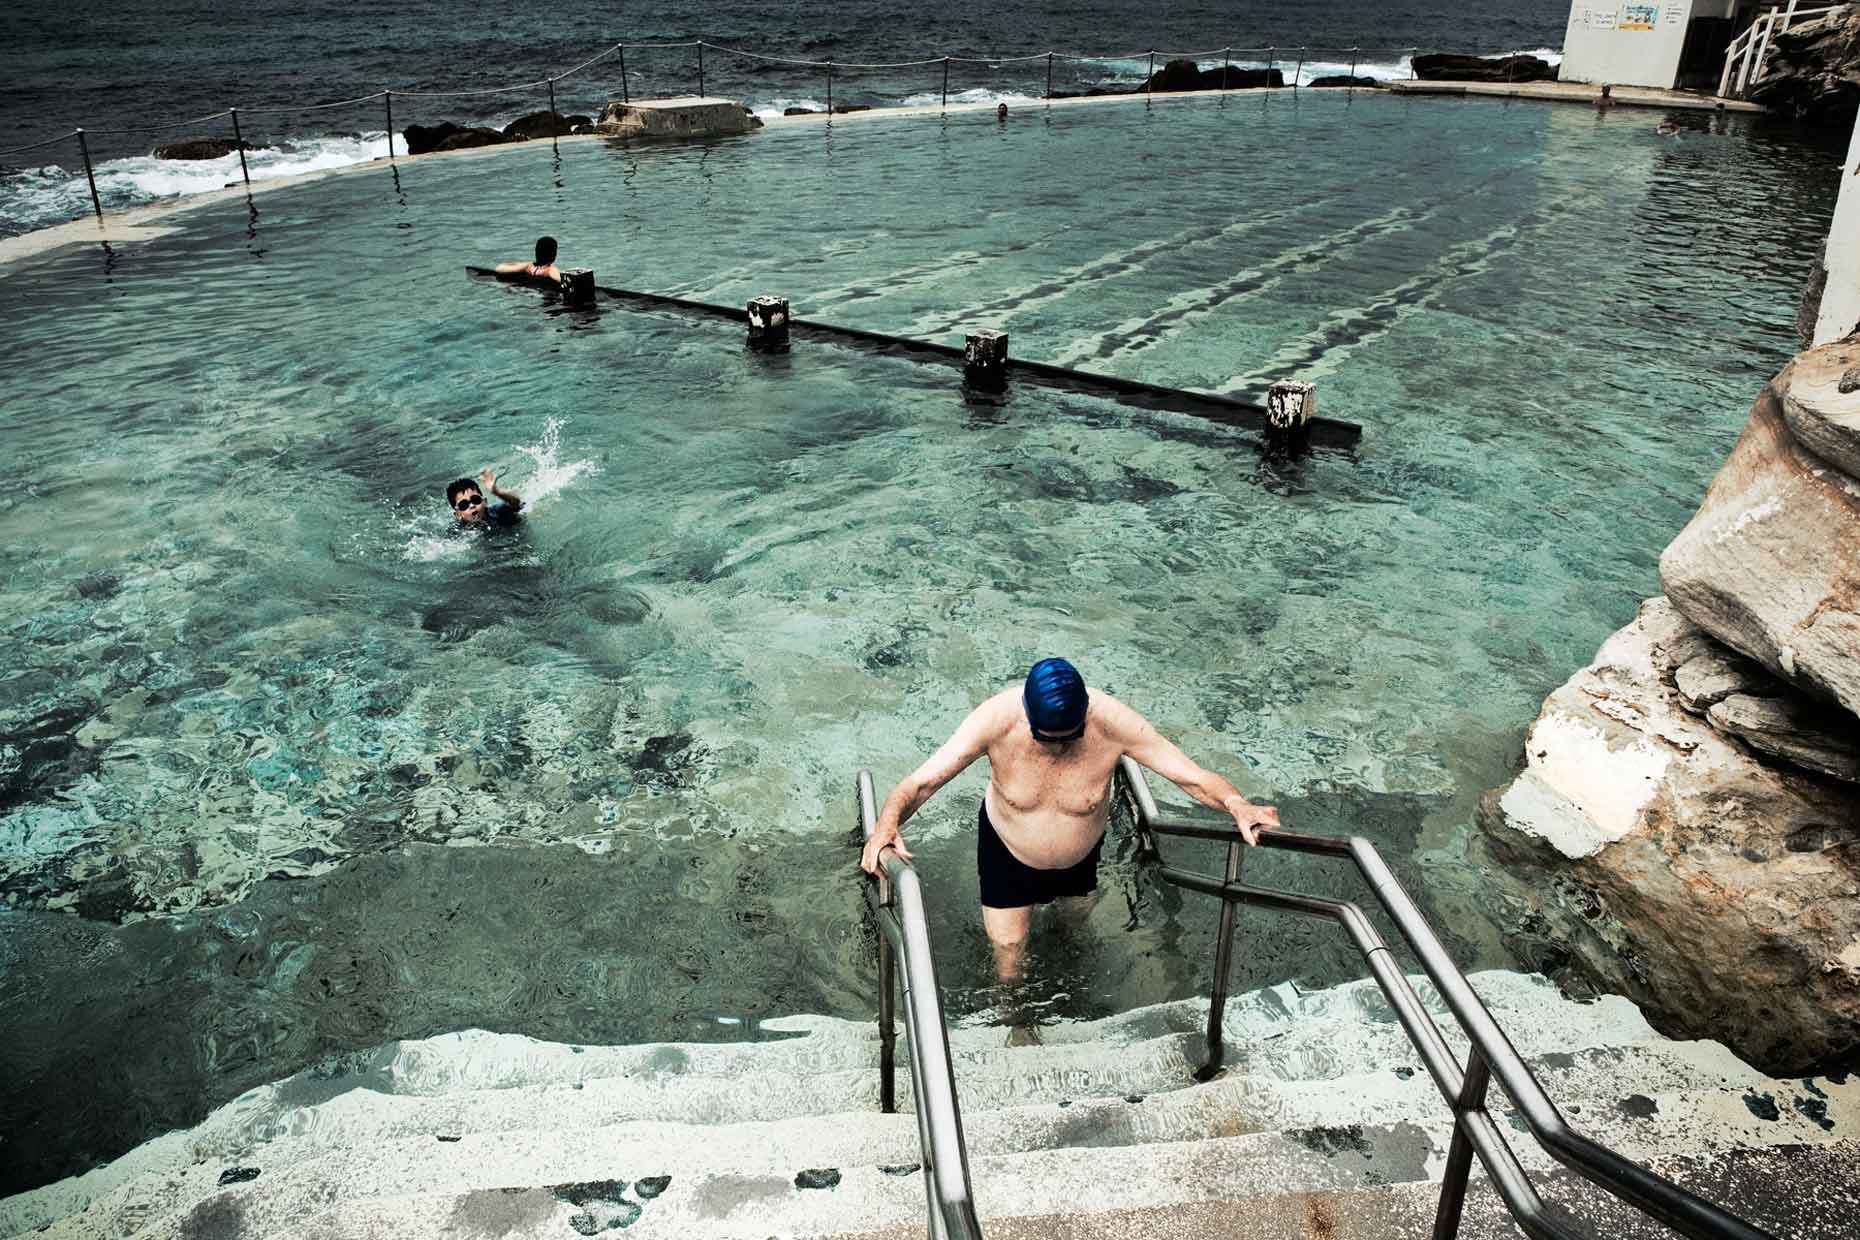 tidal-pools-australia-pim-vuik-fotografie-film-rotterdam-05.jpg